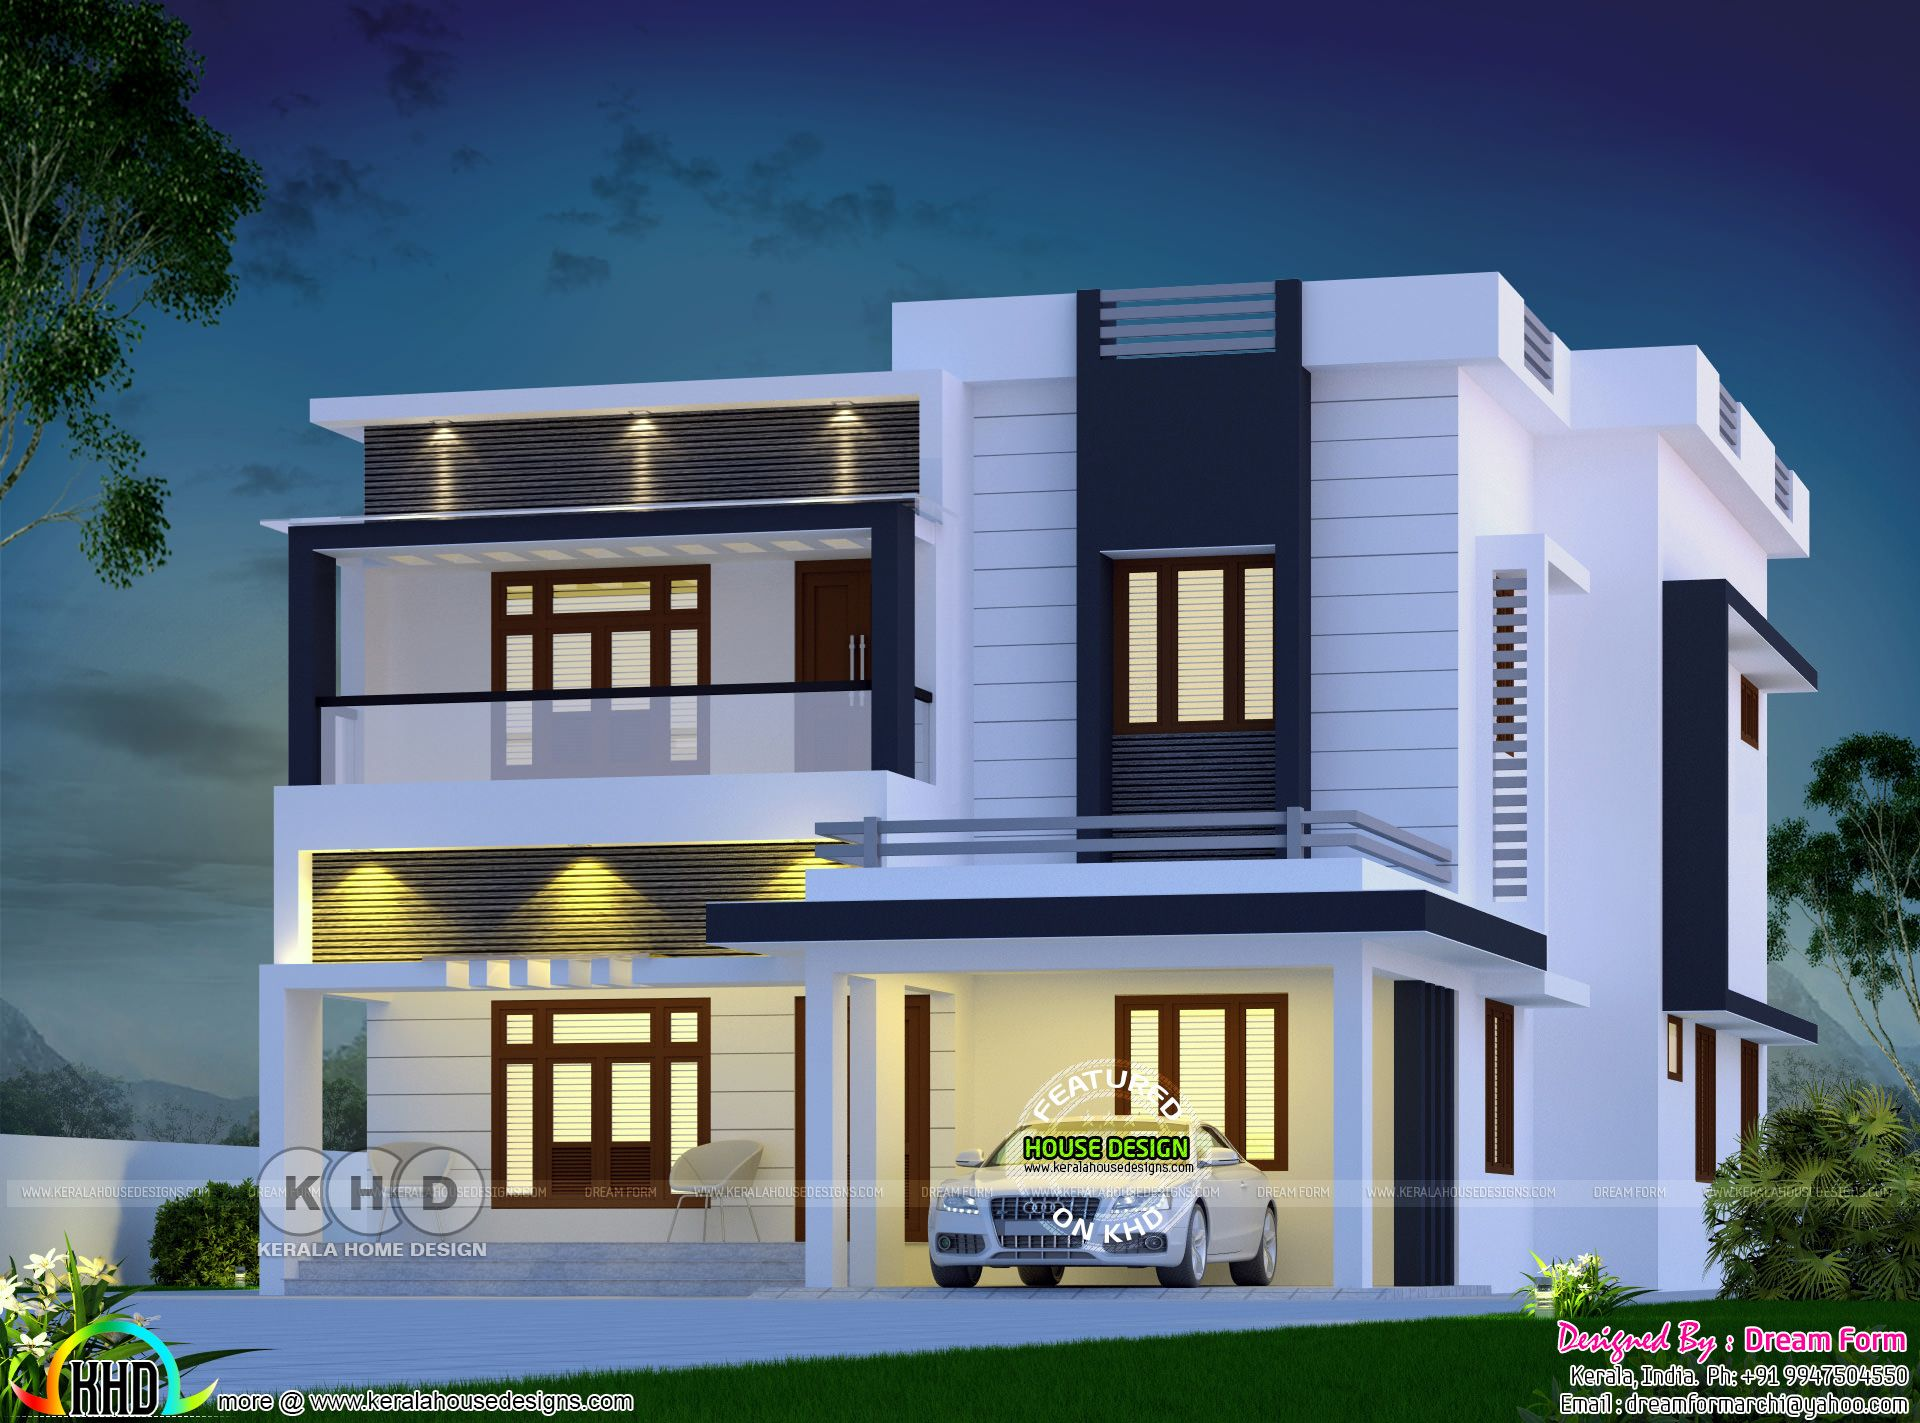 Pin by gino balakrishnan on house design pinterest house design